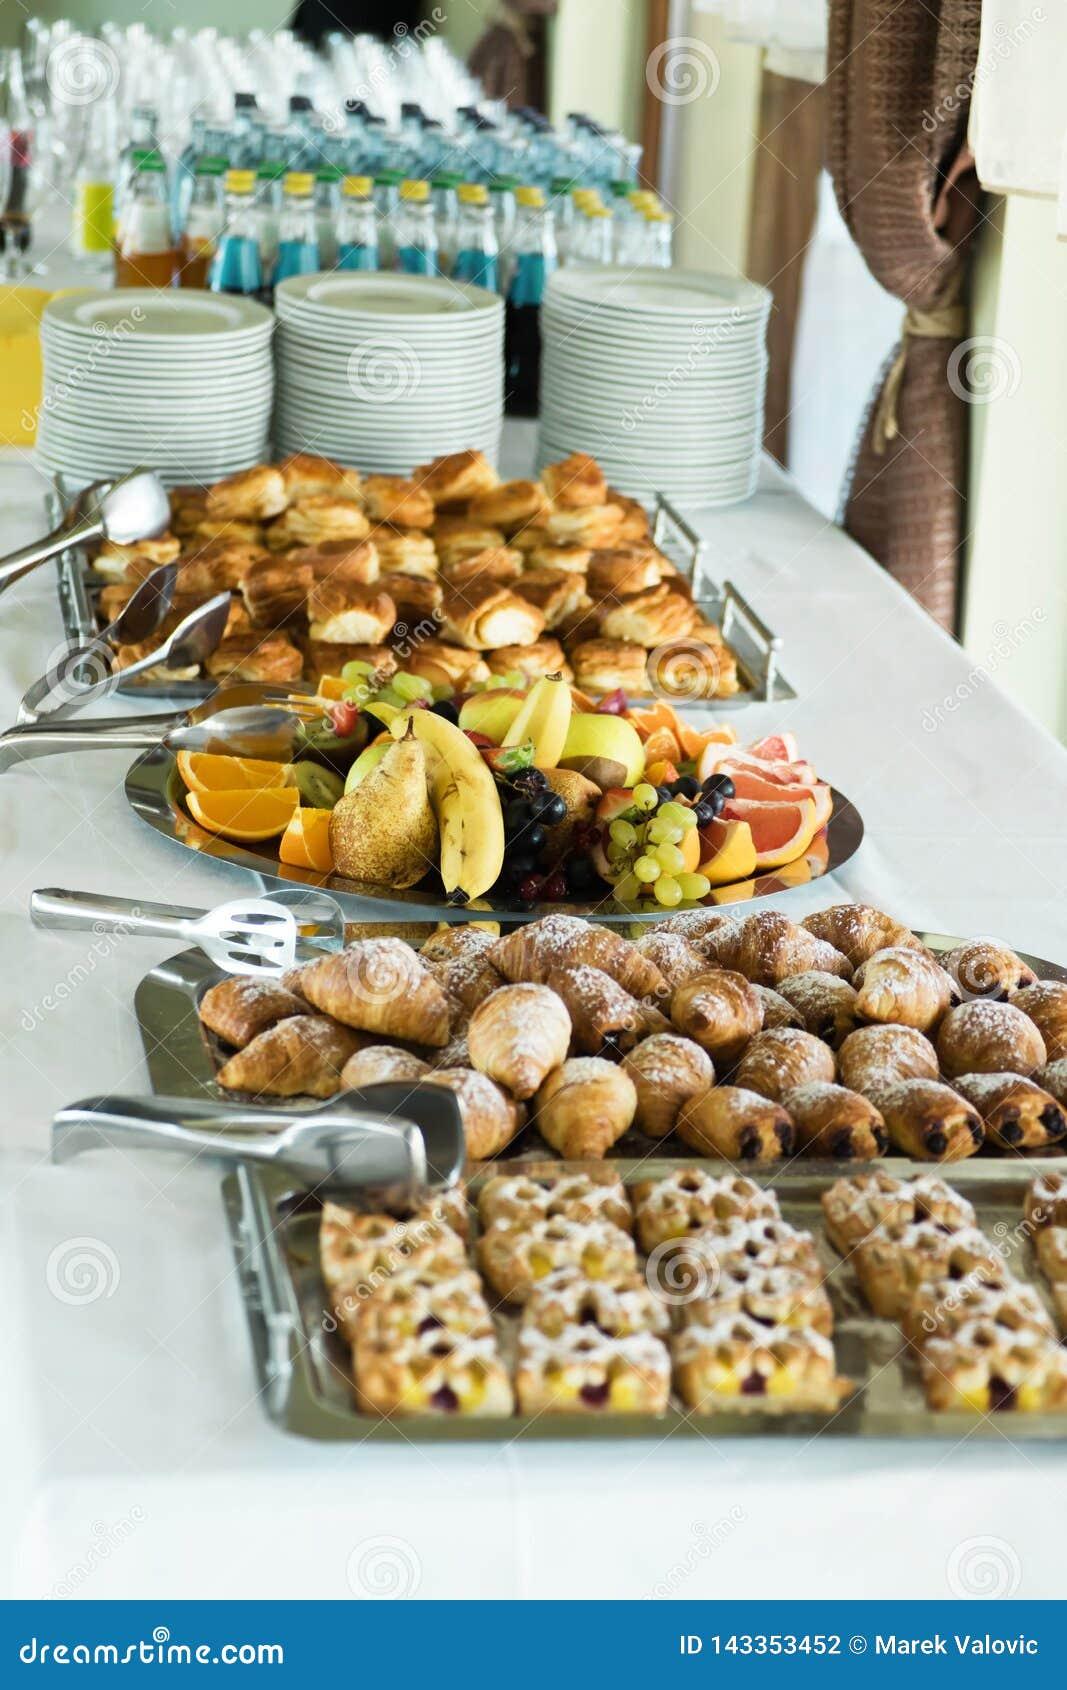 Coffee break table on seminar cakes, fruit, drinks